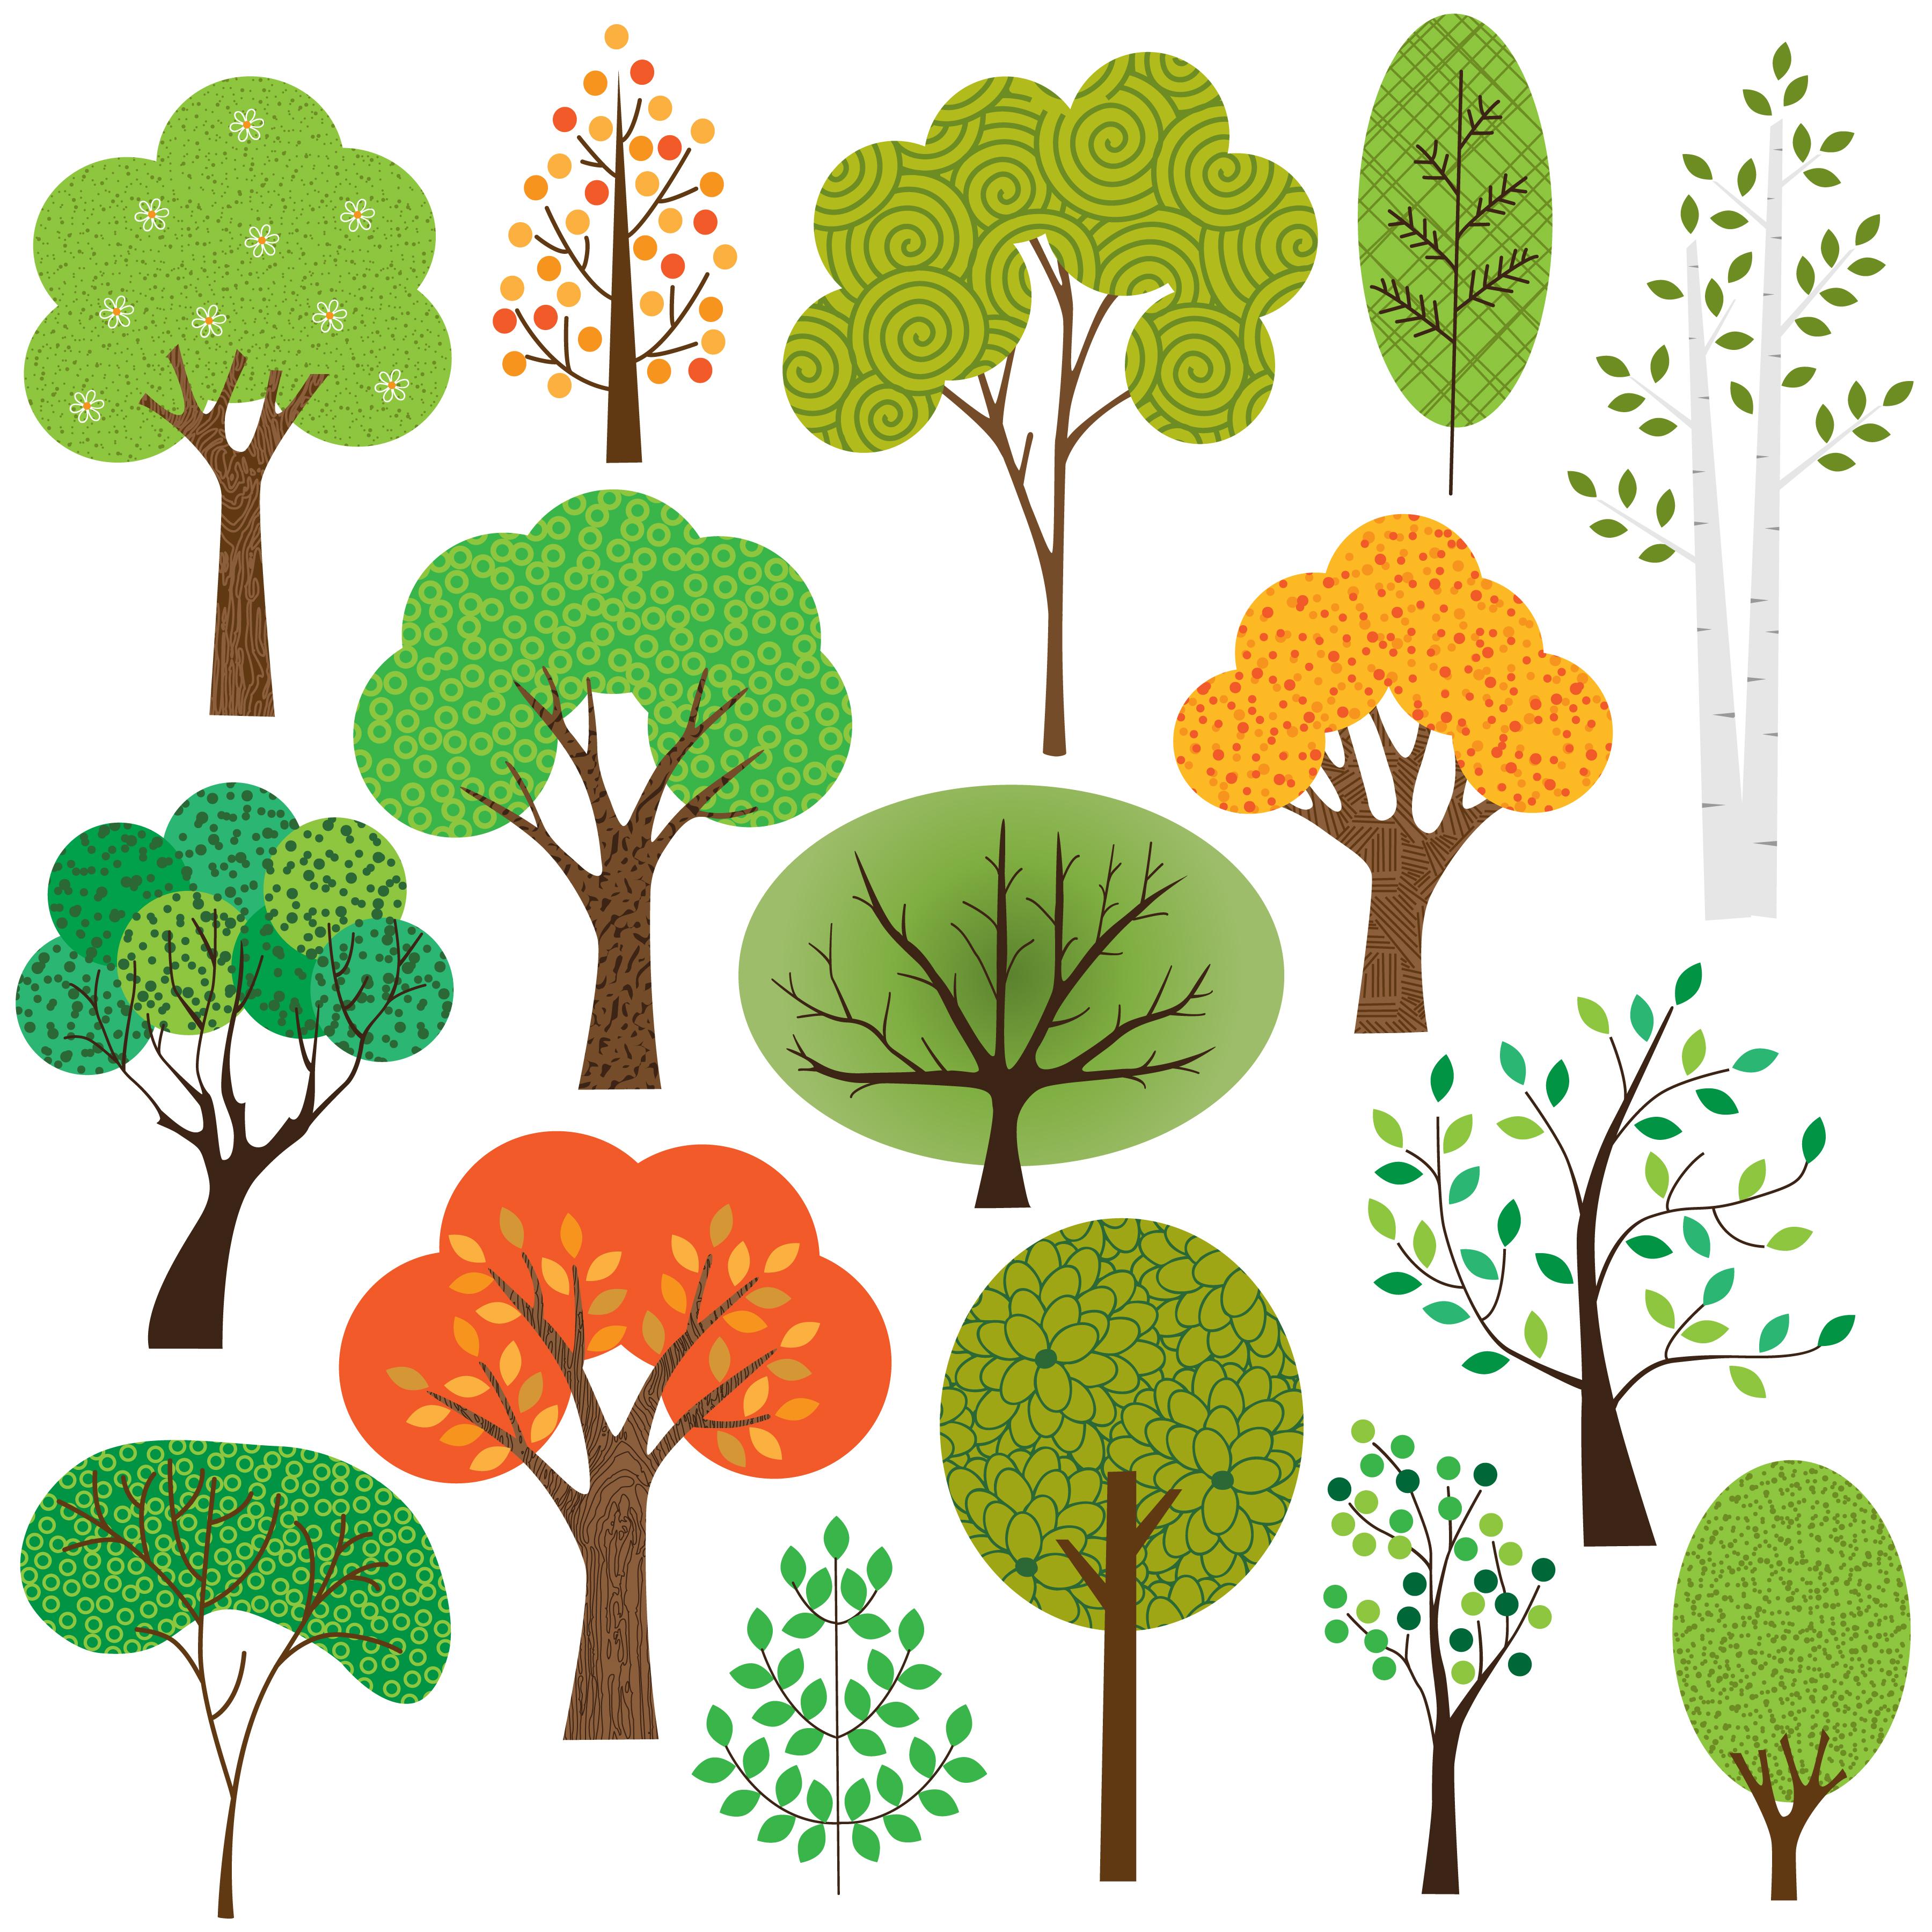 clipart trees tree vector seasonal oak vectors forest silhouette collection graphics stylized bush christmas vecteezy